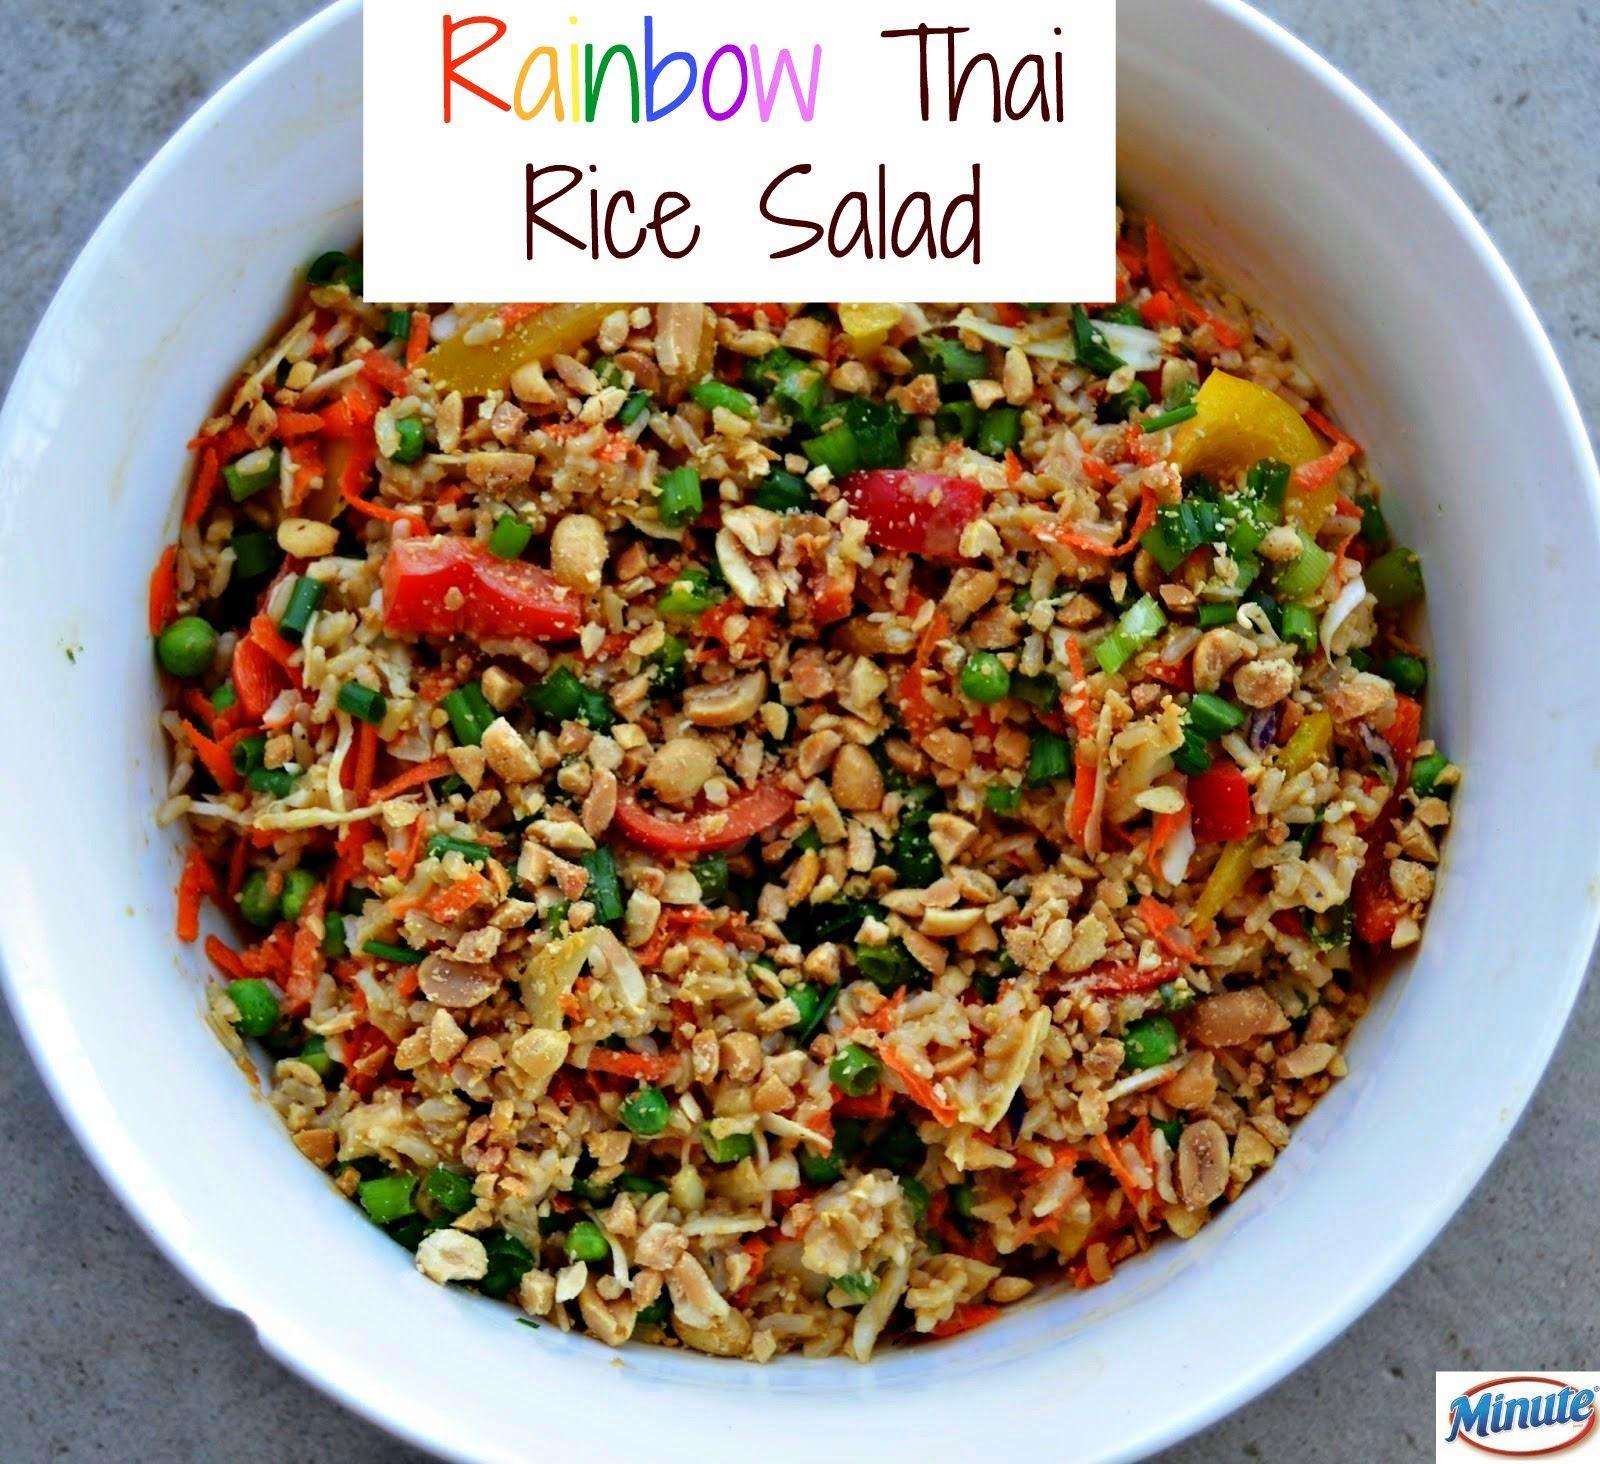 Rainbow Thai Rice Salad Kitchen Aid Mixer Giveaway